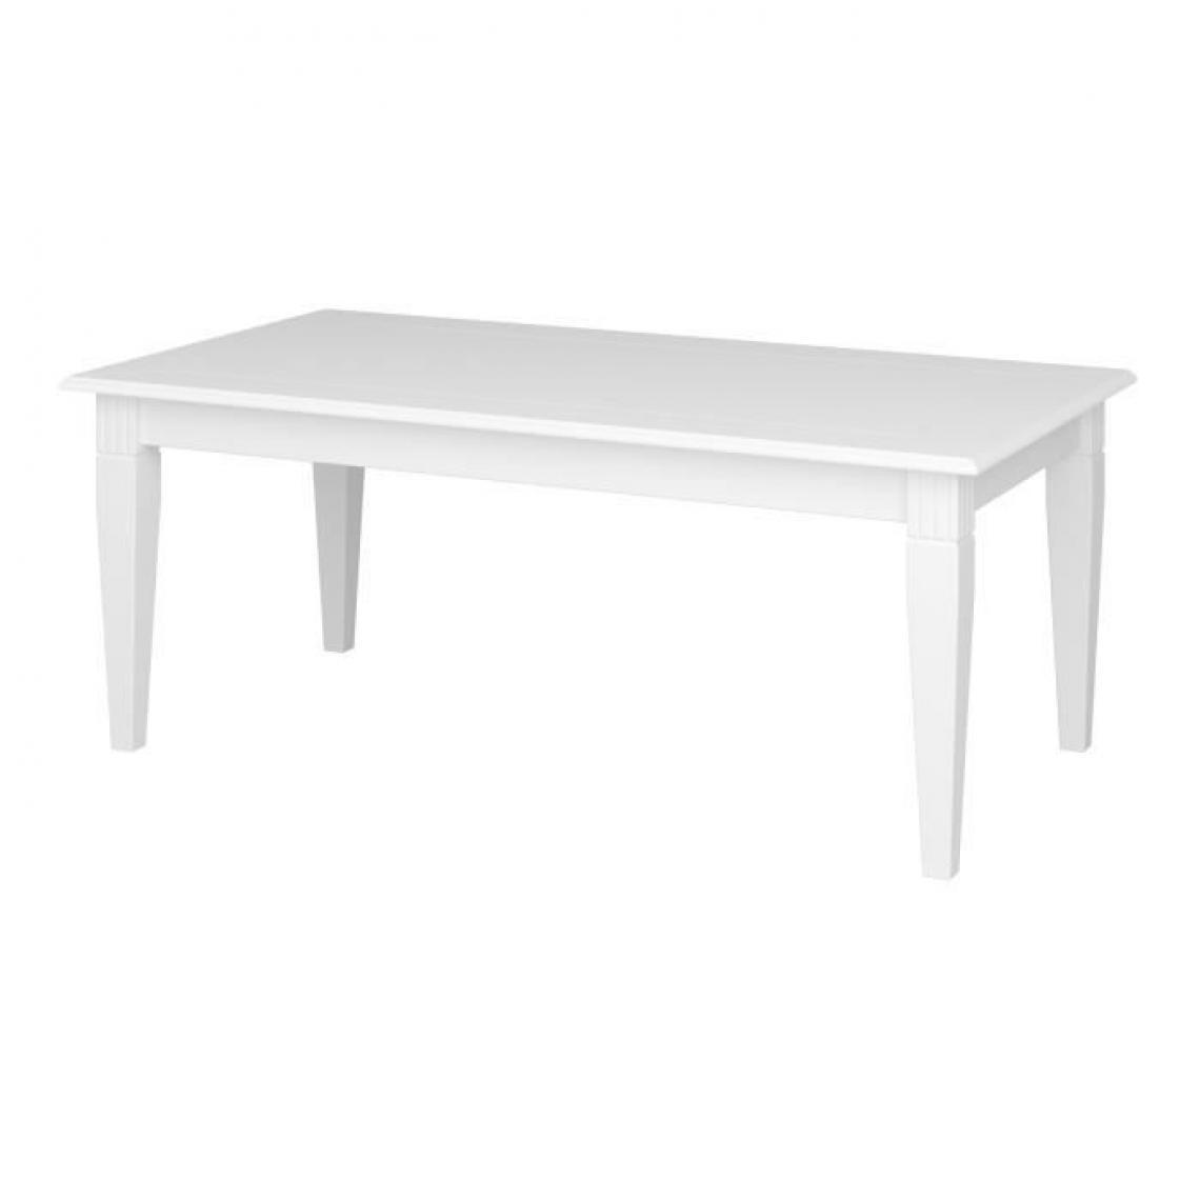 Cstore Table basse - Laqué blanc - MDF - L 130 x P 70 x H 51,3 cm